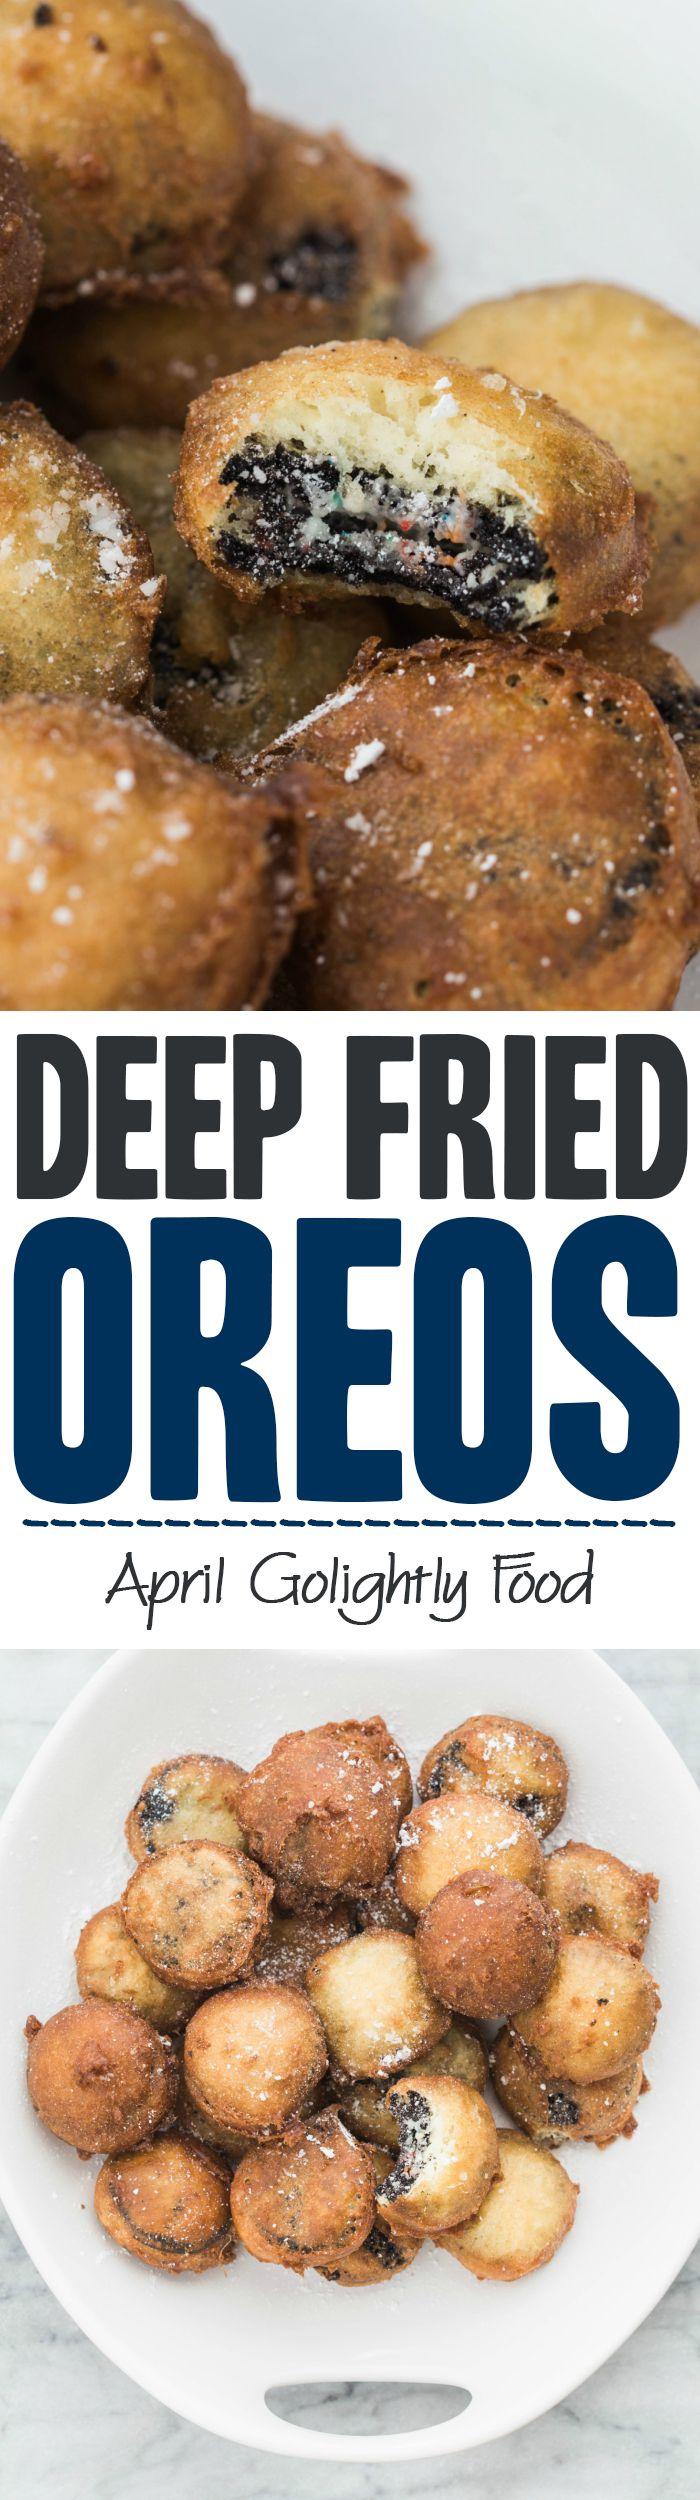 deep fried oreos recipe - photo #20